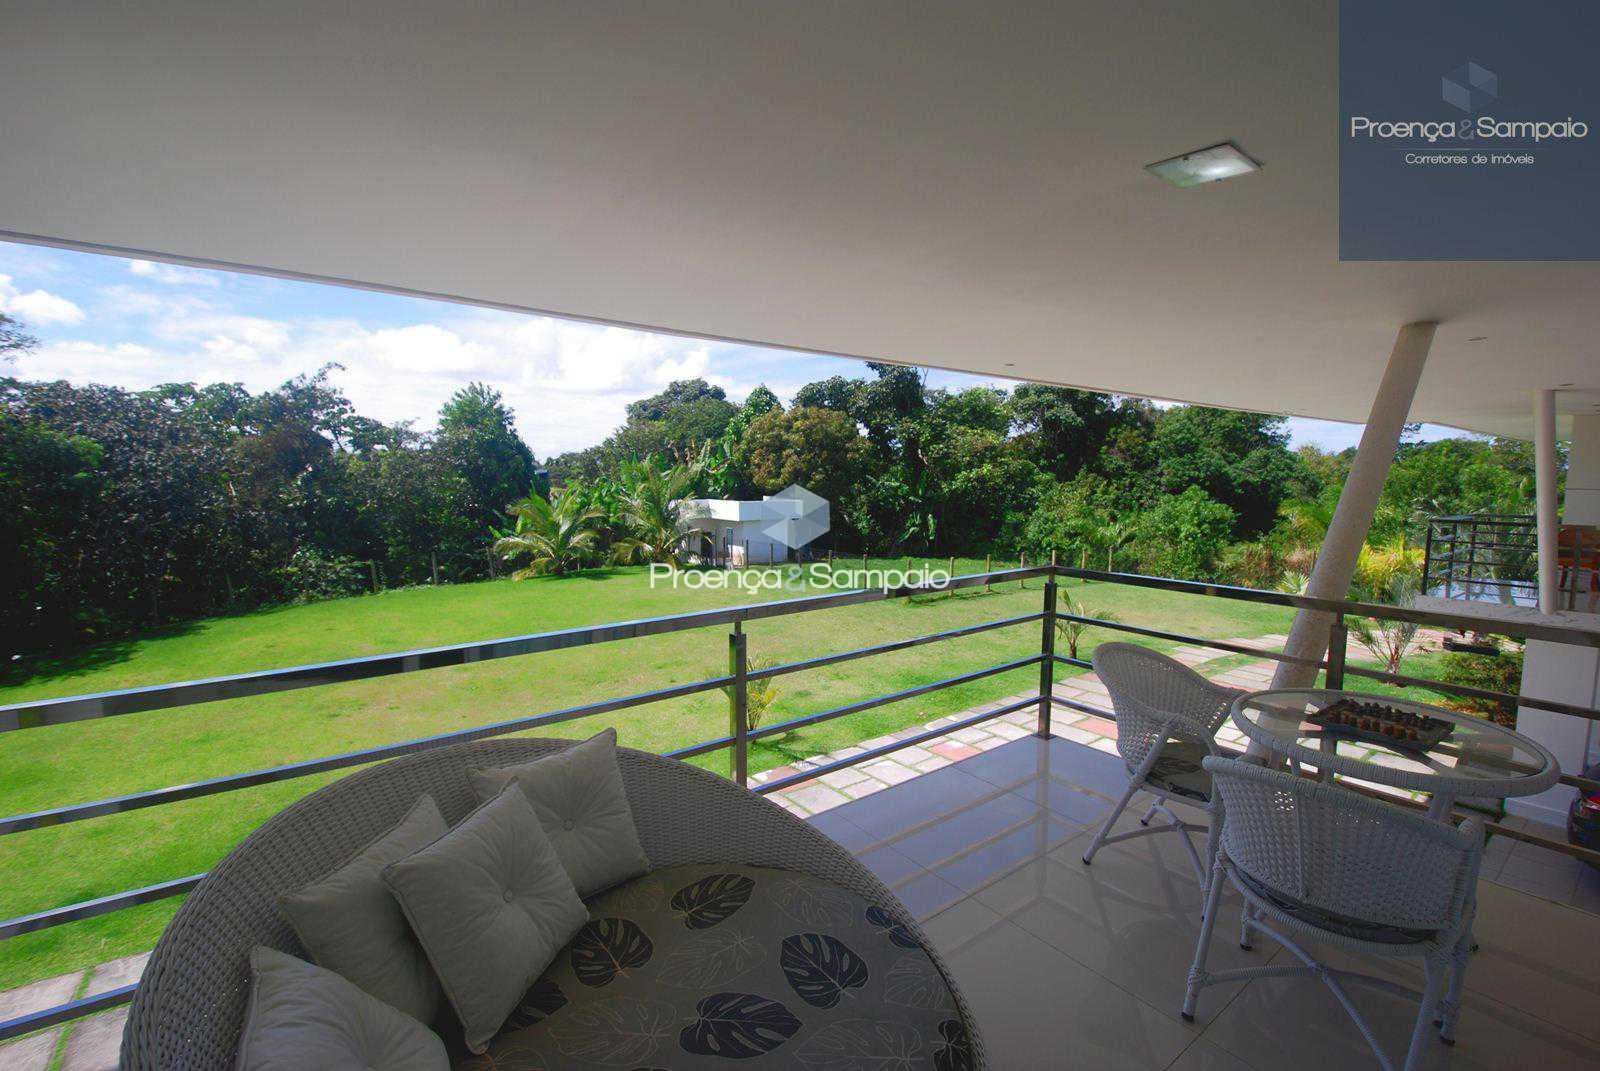 FOTO26 - Casa em Condomínio à venda Avenida Santos Dumont,Lauro de Freitas,BA - R$ 7.000.000 - PSCN50005 - 28